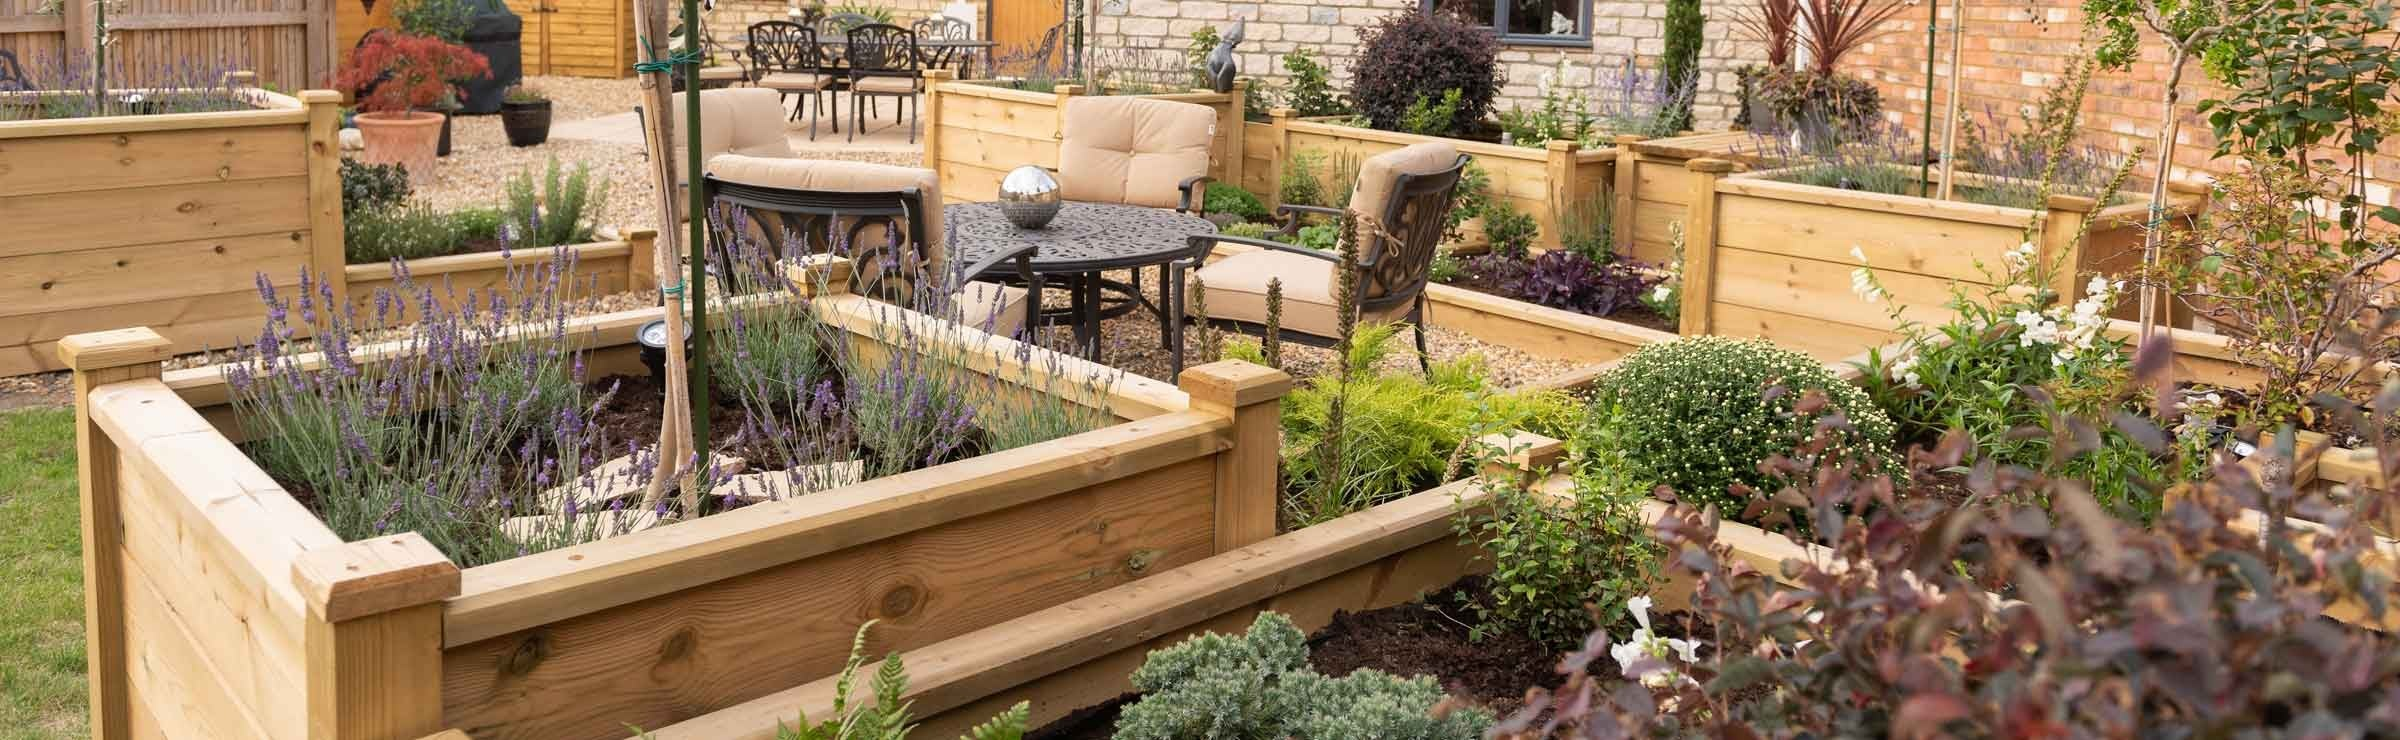 Raised Garden Beds Buy Online At Harrod Horticultural